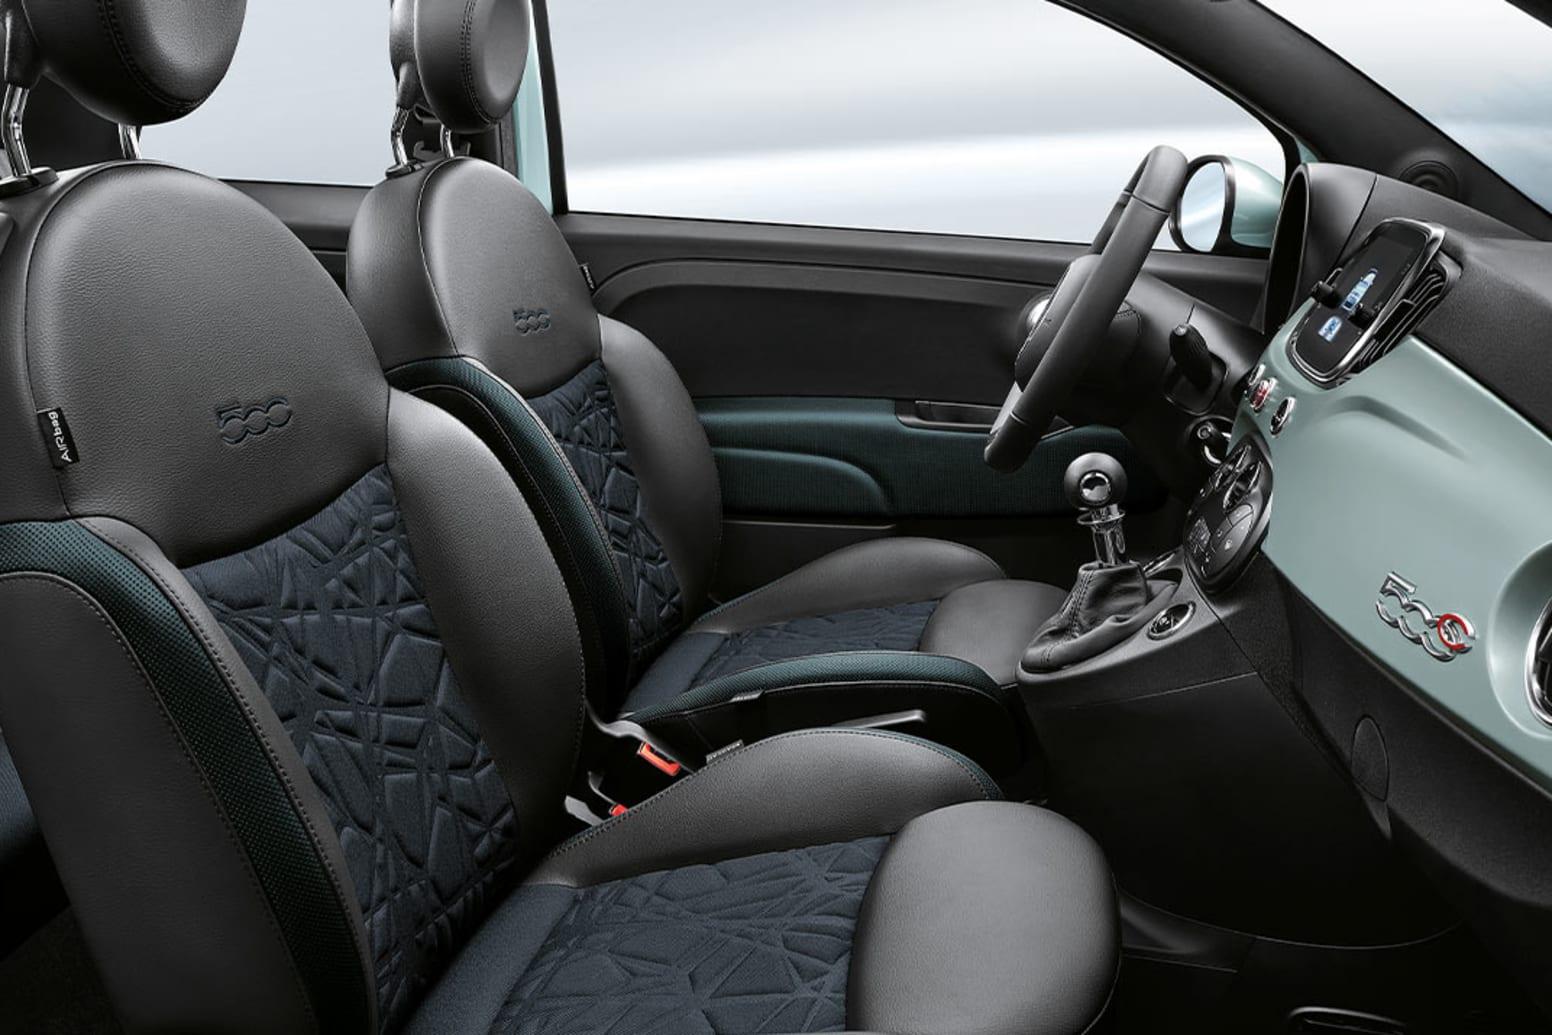 Fiat 500 Hybrid Interior Front Seats